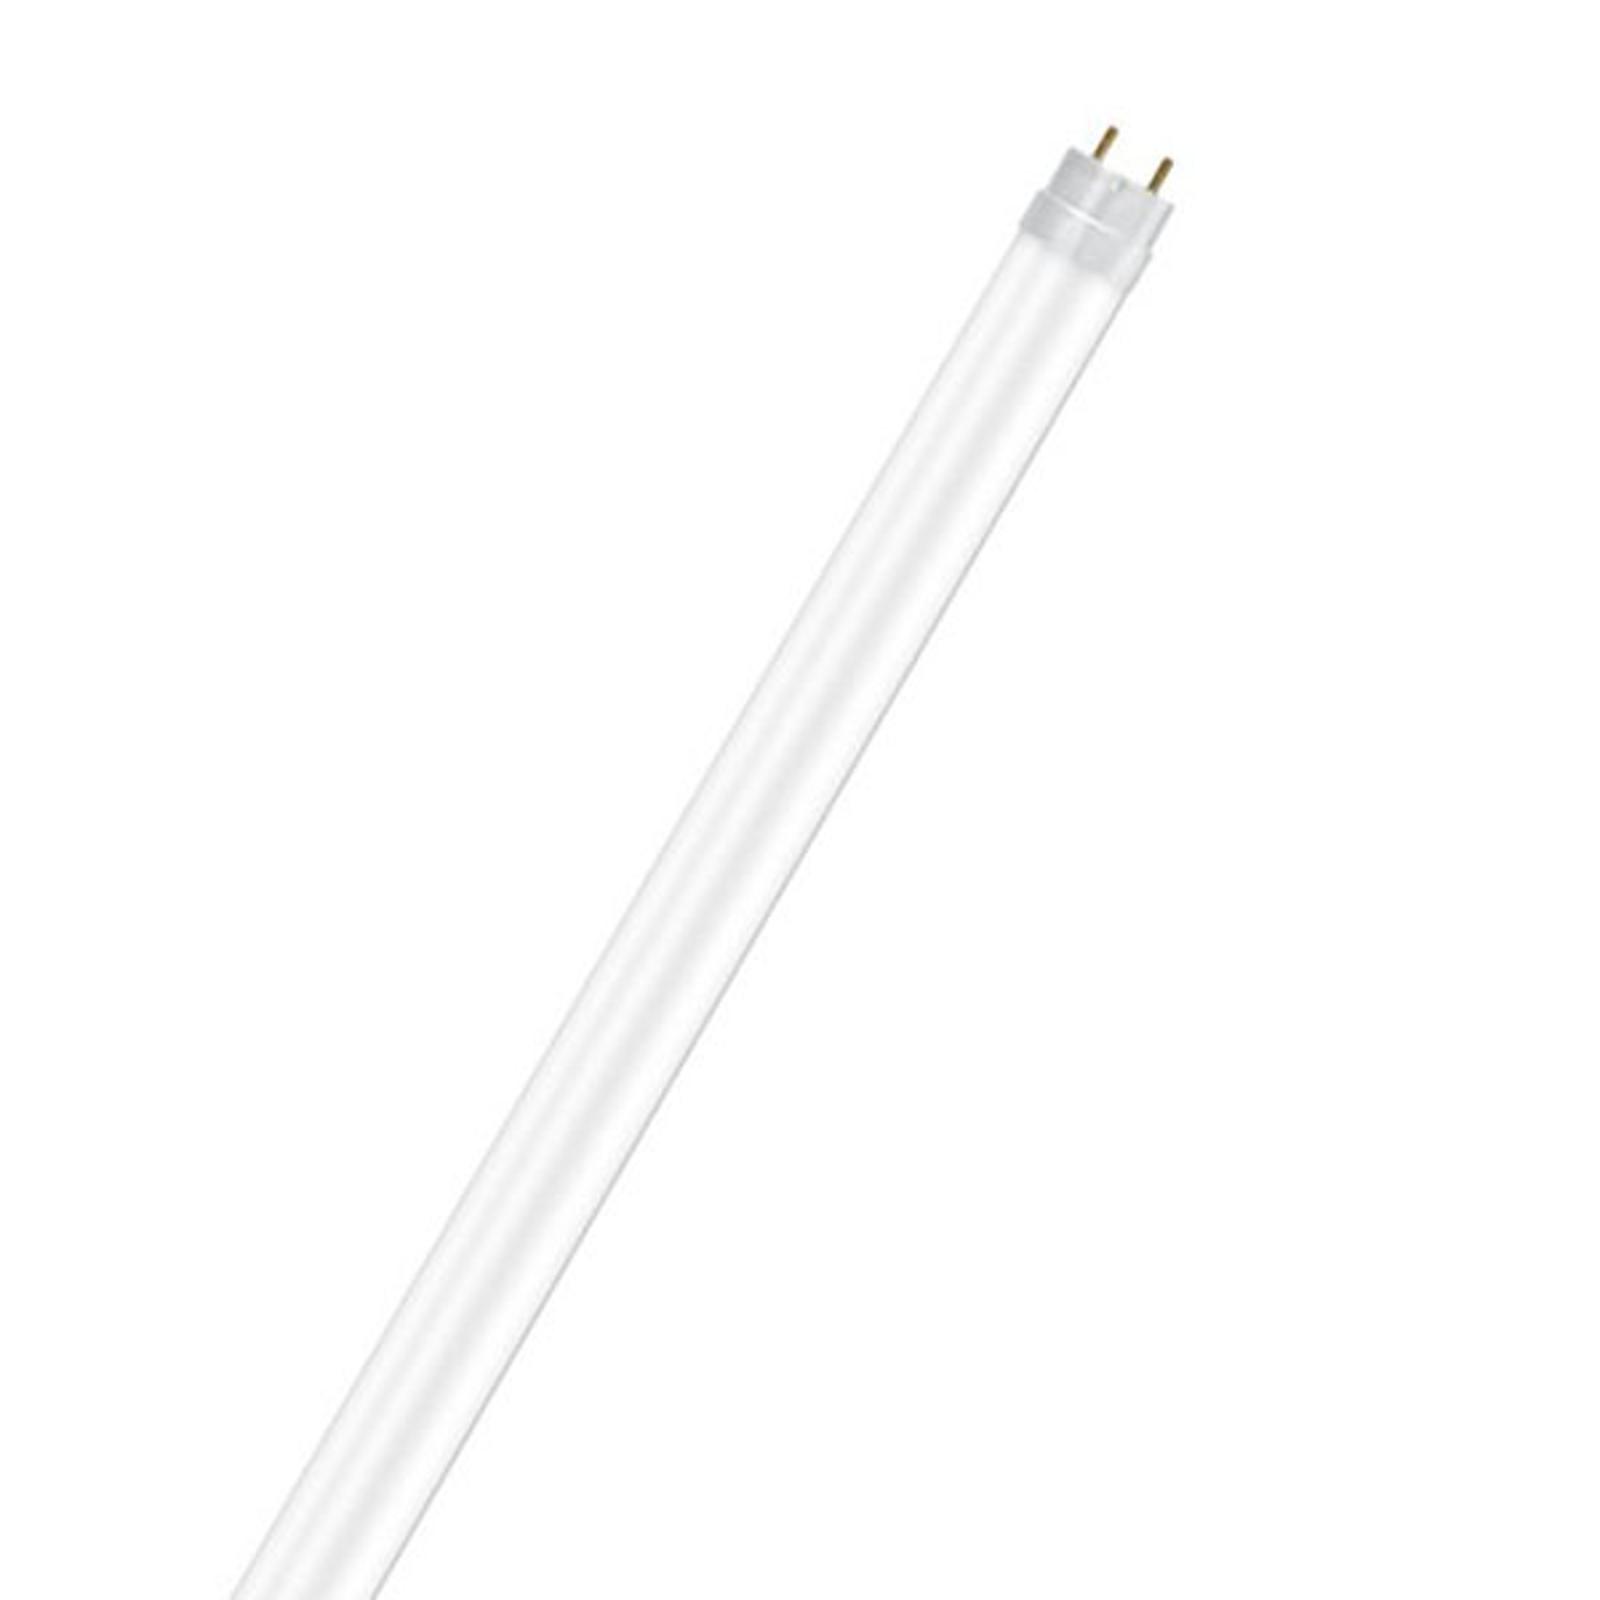 OSRAM-LED-putki G13 T8 60cm SubstiTUBE 6,6W 6 500K